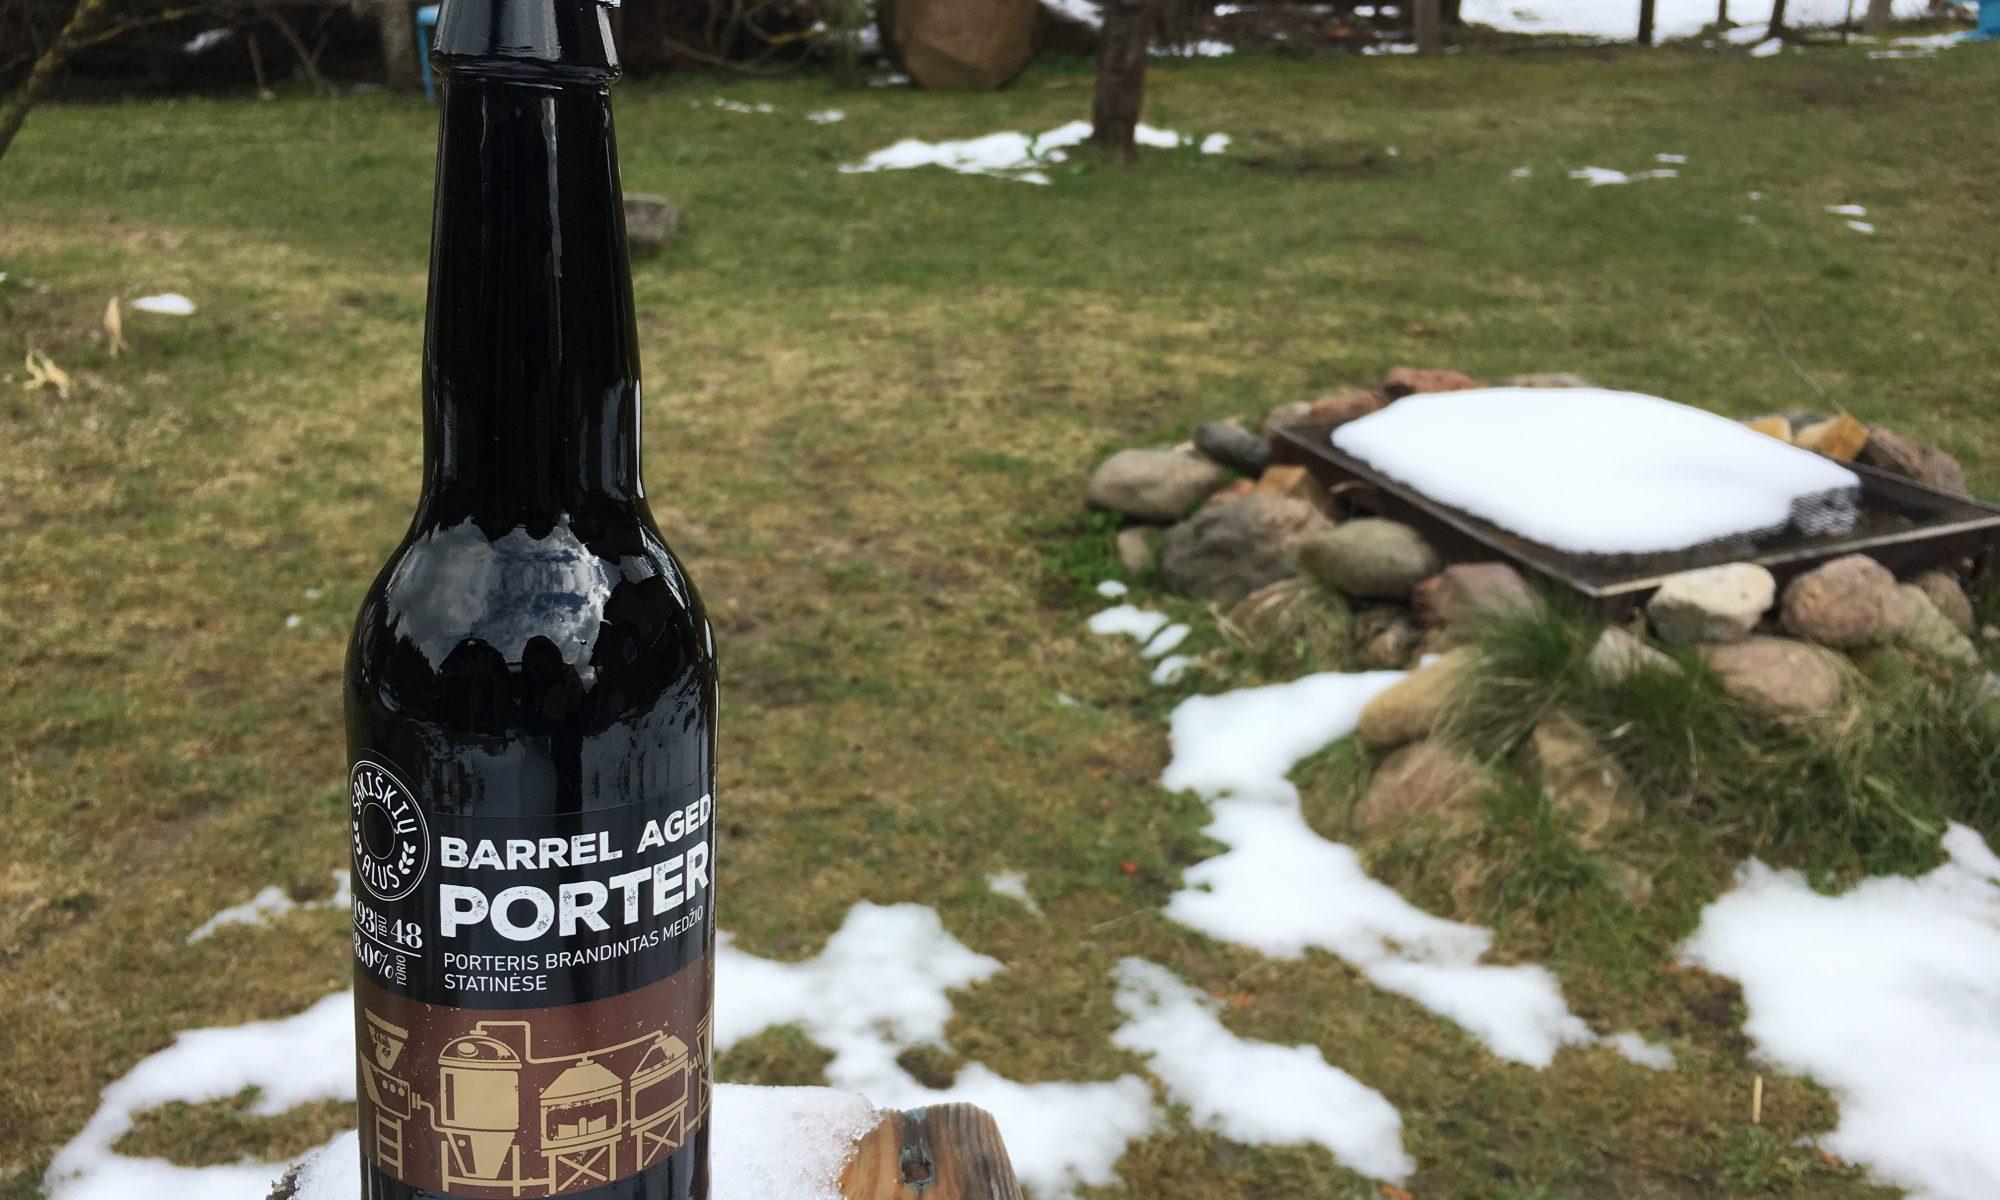 modernus-lietuviskas-alus-sakiskiu-barrel-aged-porter-porteris-brandintas-medzio-statinese